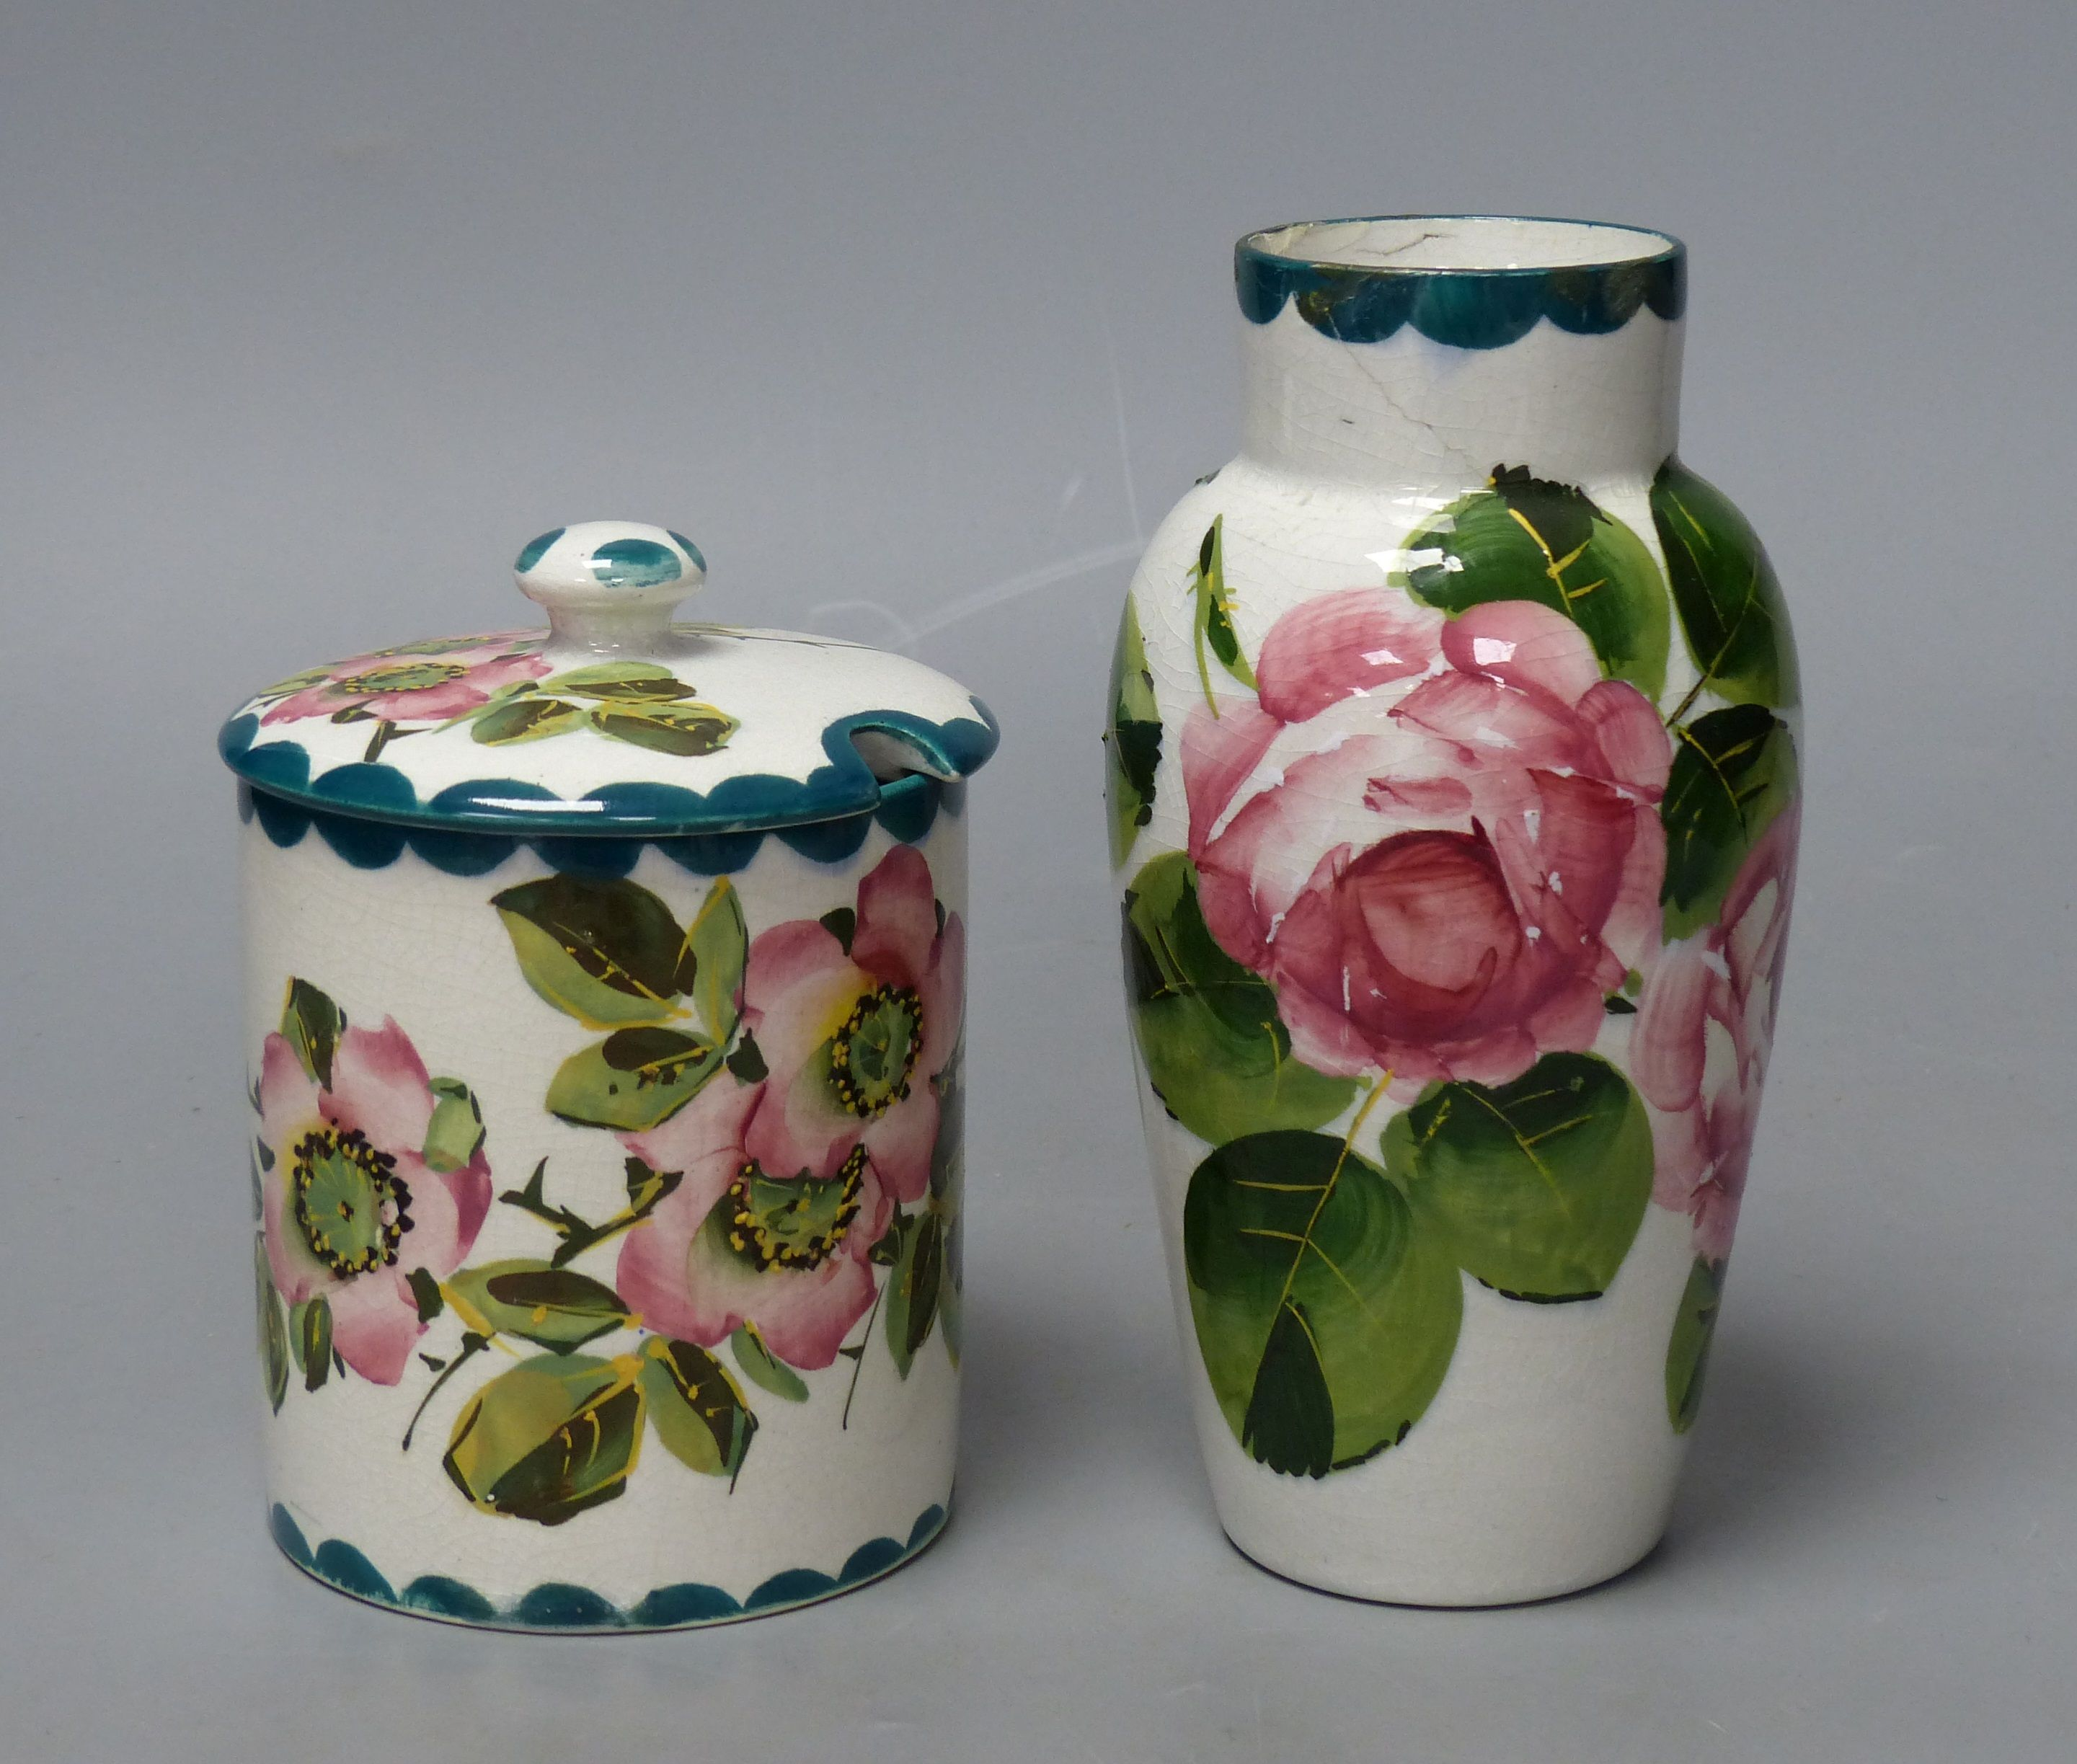 A Wemyss cabbage rose vase and an apple blossom sugar pot, tallest 16cm